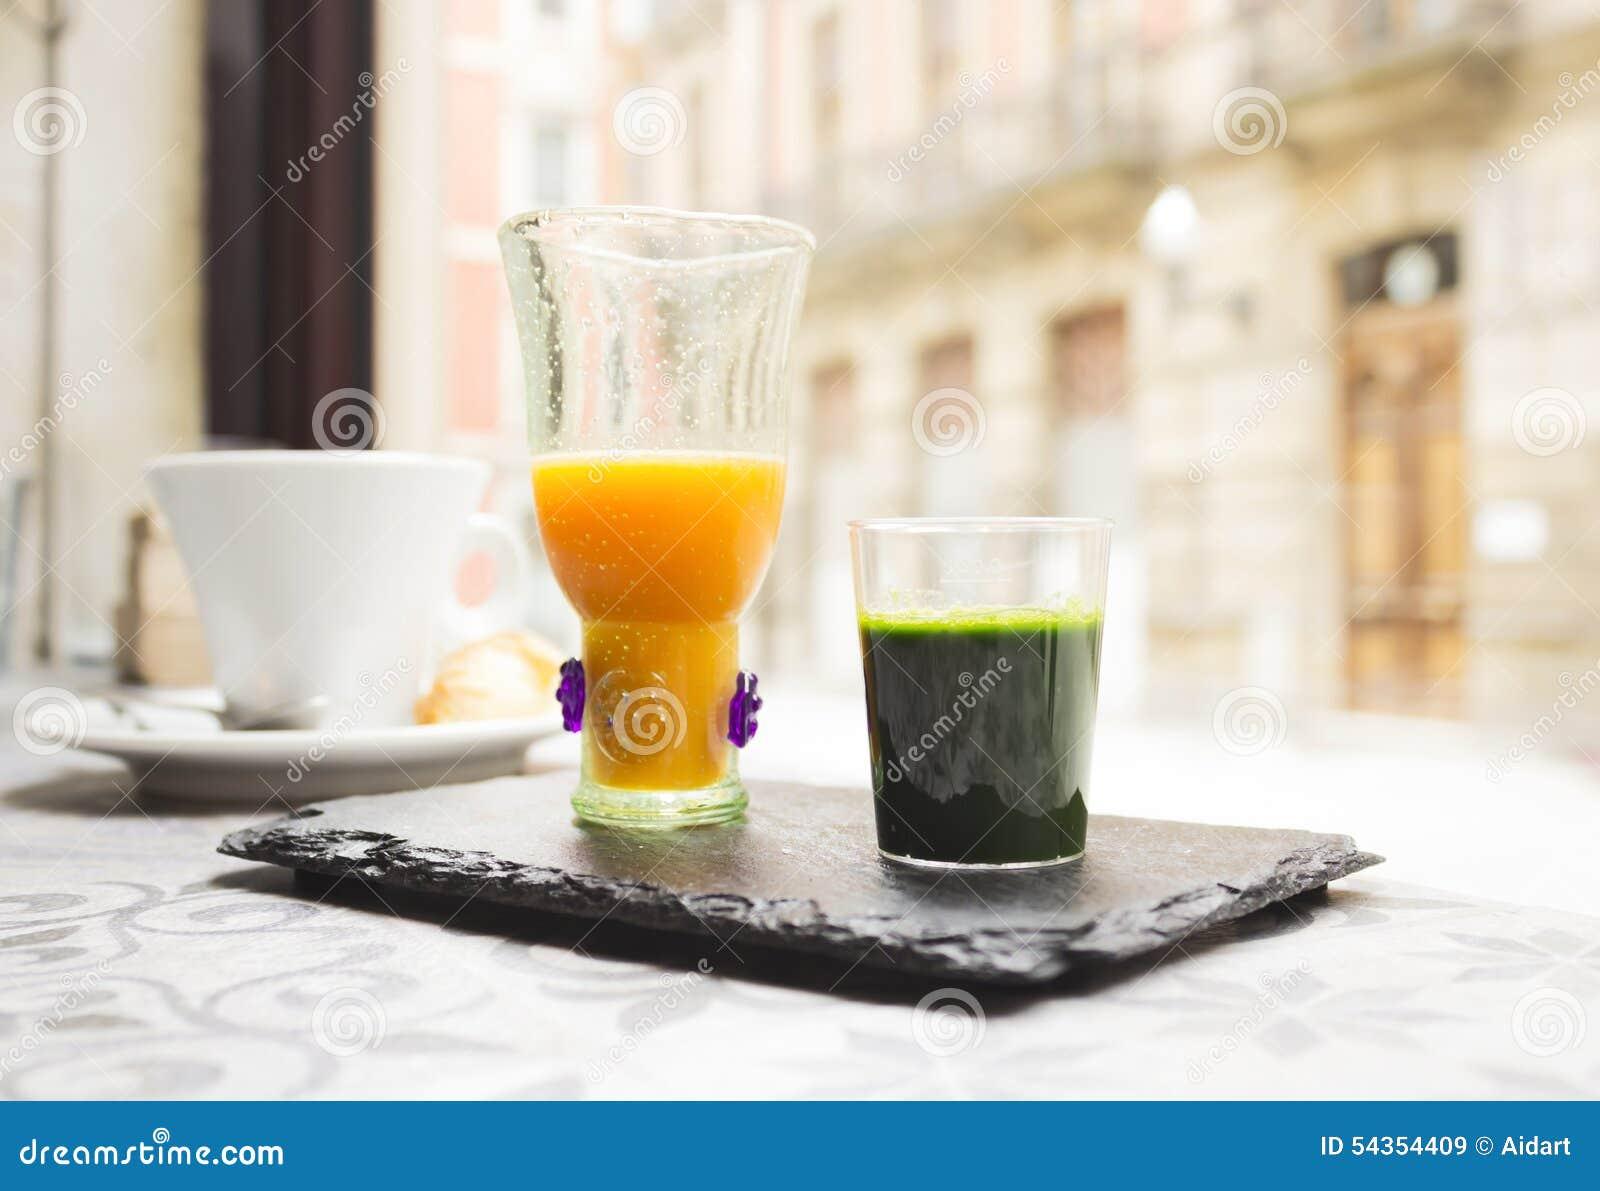 Wheat grass short and orange juice